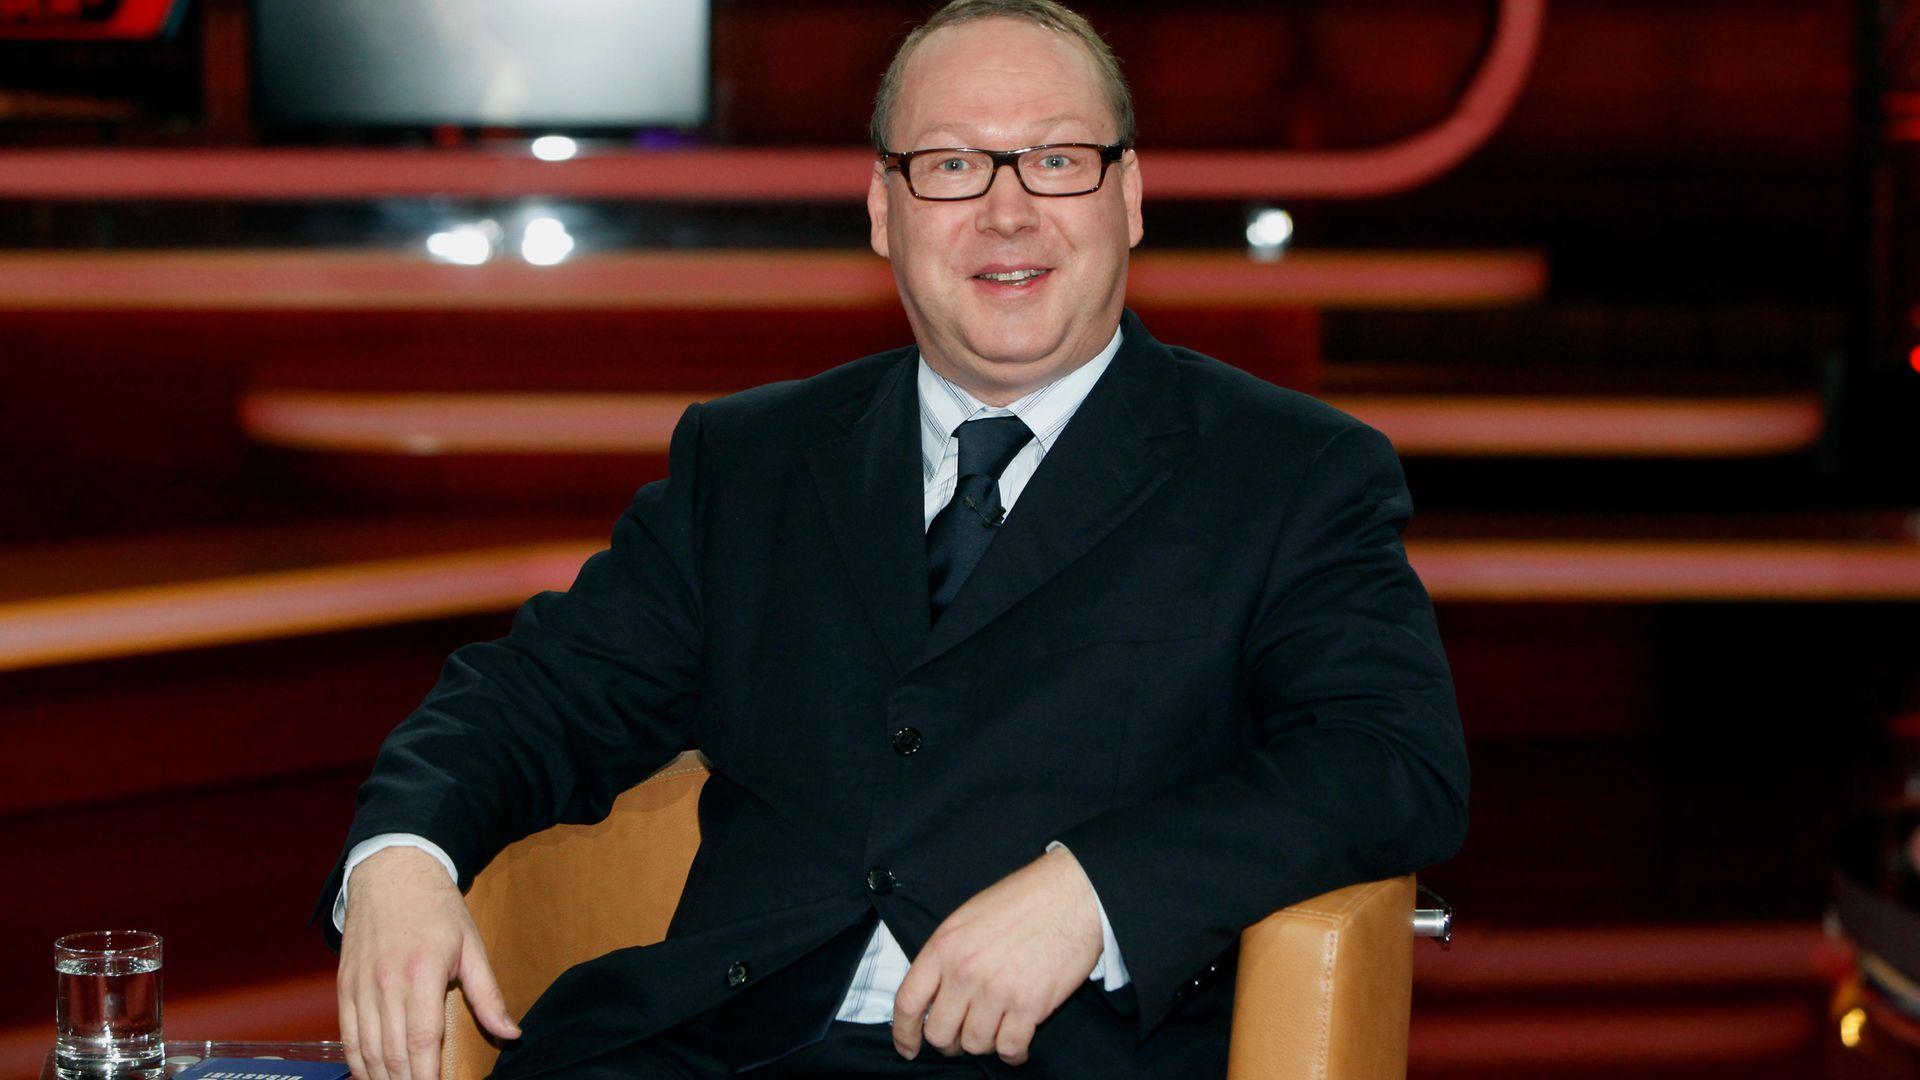 Max Otte, new leader of Germany's Werte Union - Credit: ullstein bild via Getty Images